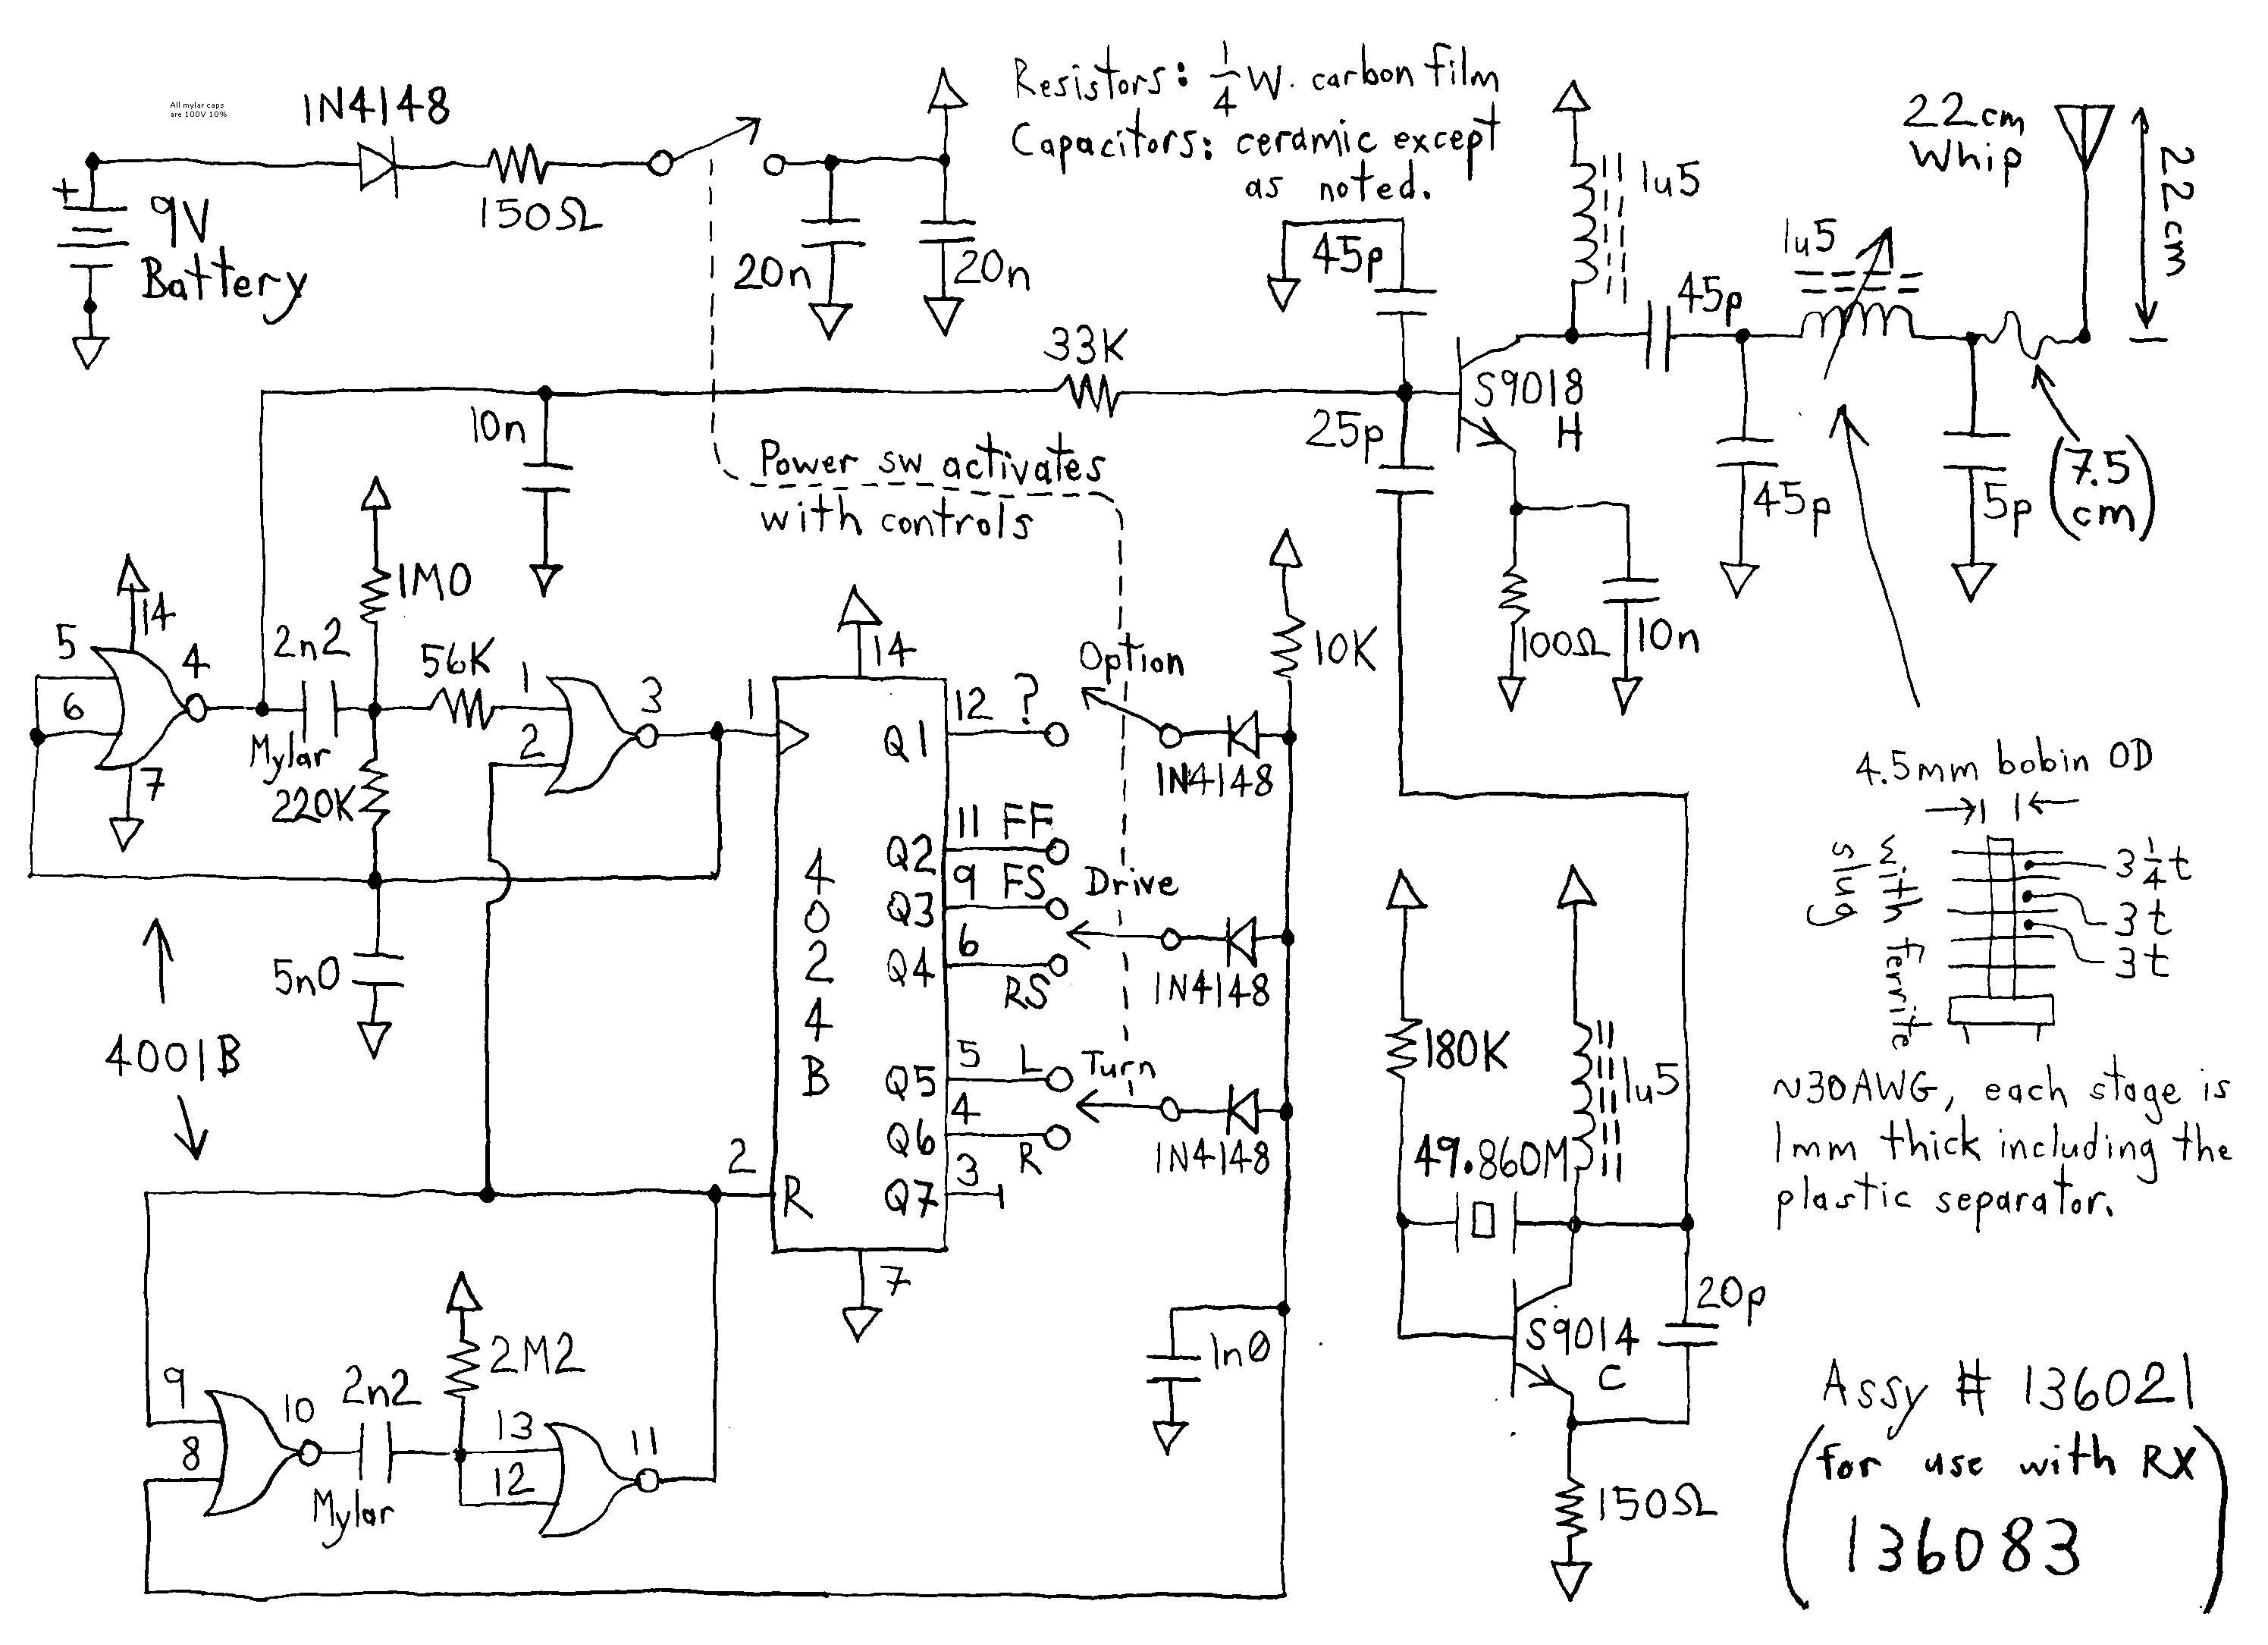 Automotive Wiring Diagrams Master Automotive Wiring Diagrams And Electrical Symbols Wiring